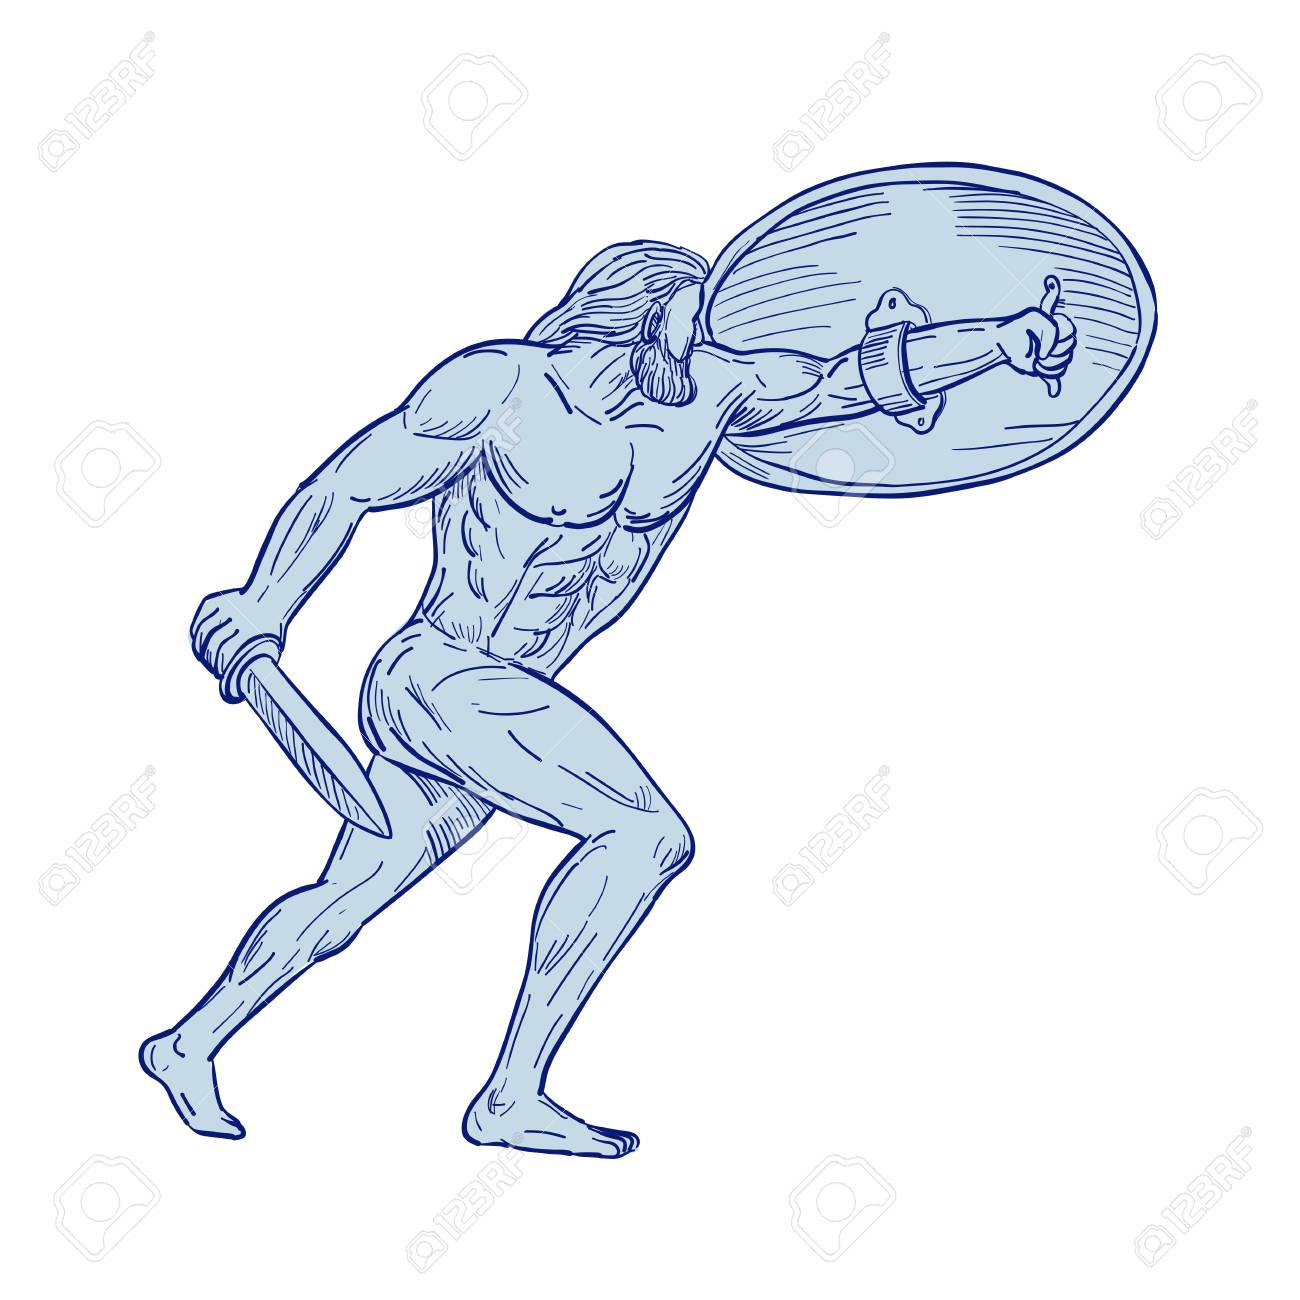 Roman Warriors Clipart Roman Person - Ancient Rome Soldier Gif - Free  Transparent PNG Clipart Images Download